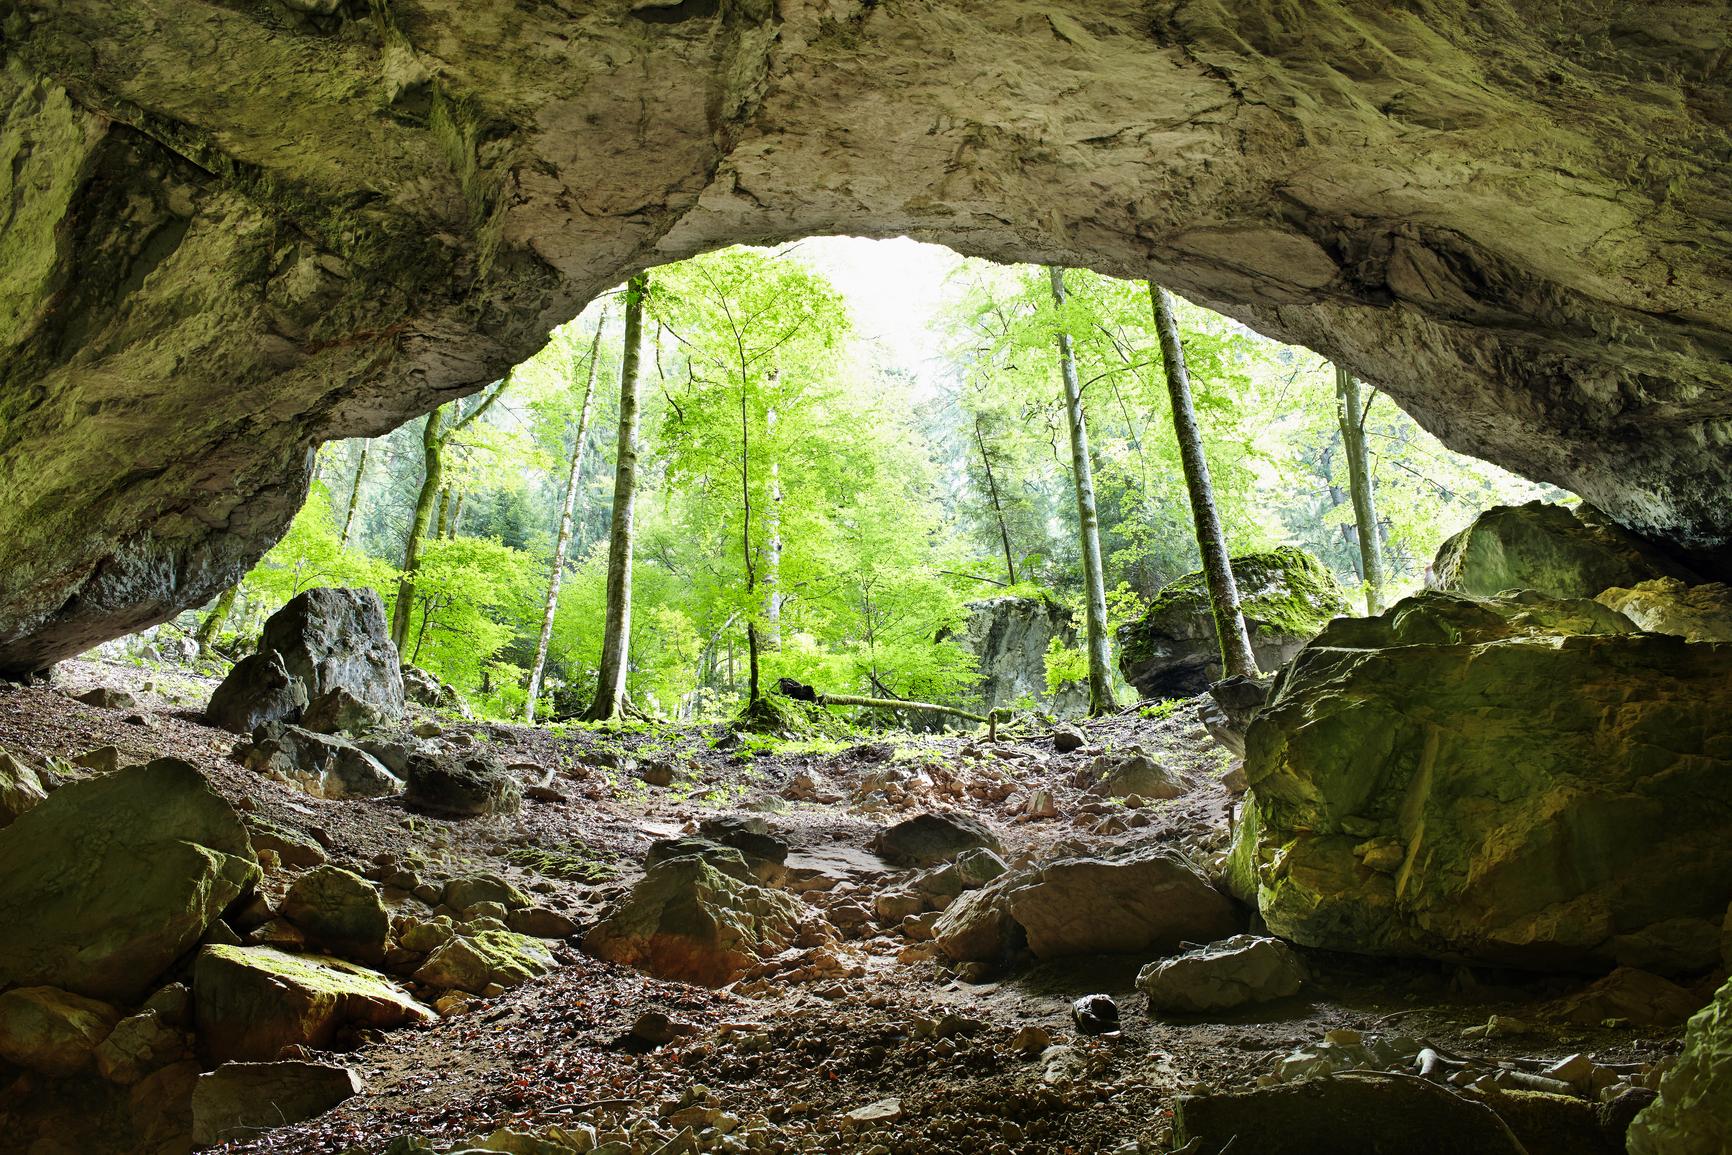 The Galbena River Cave in Apuseni mountains